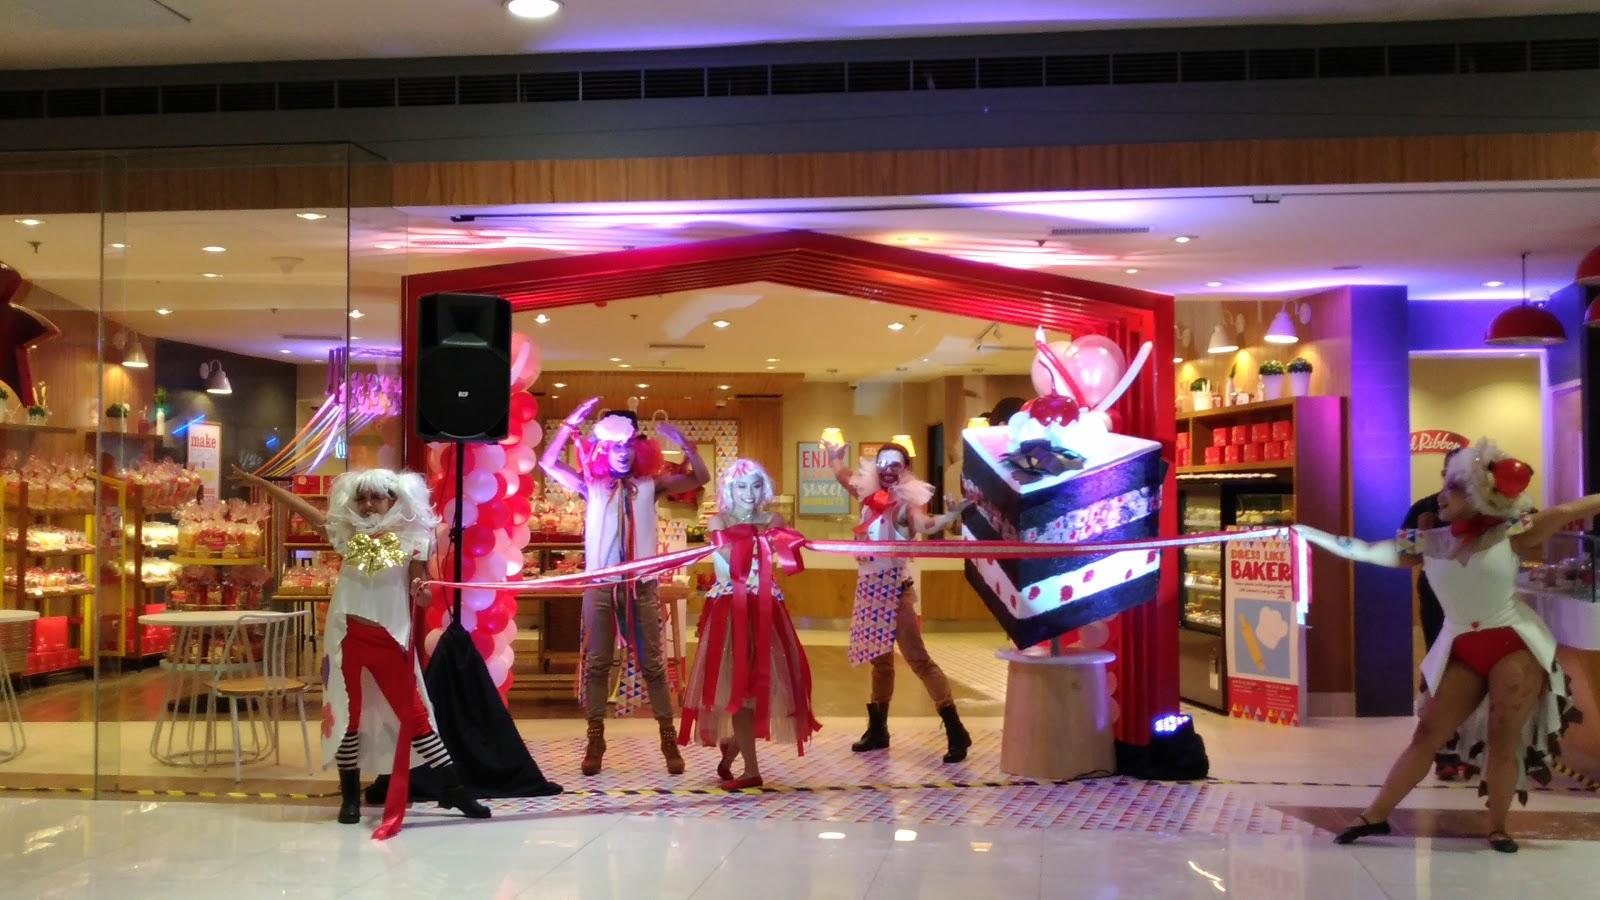 Red Ribbon Launches Its 1st Flagship Store Enjoying Wonderful World